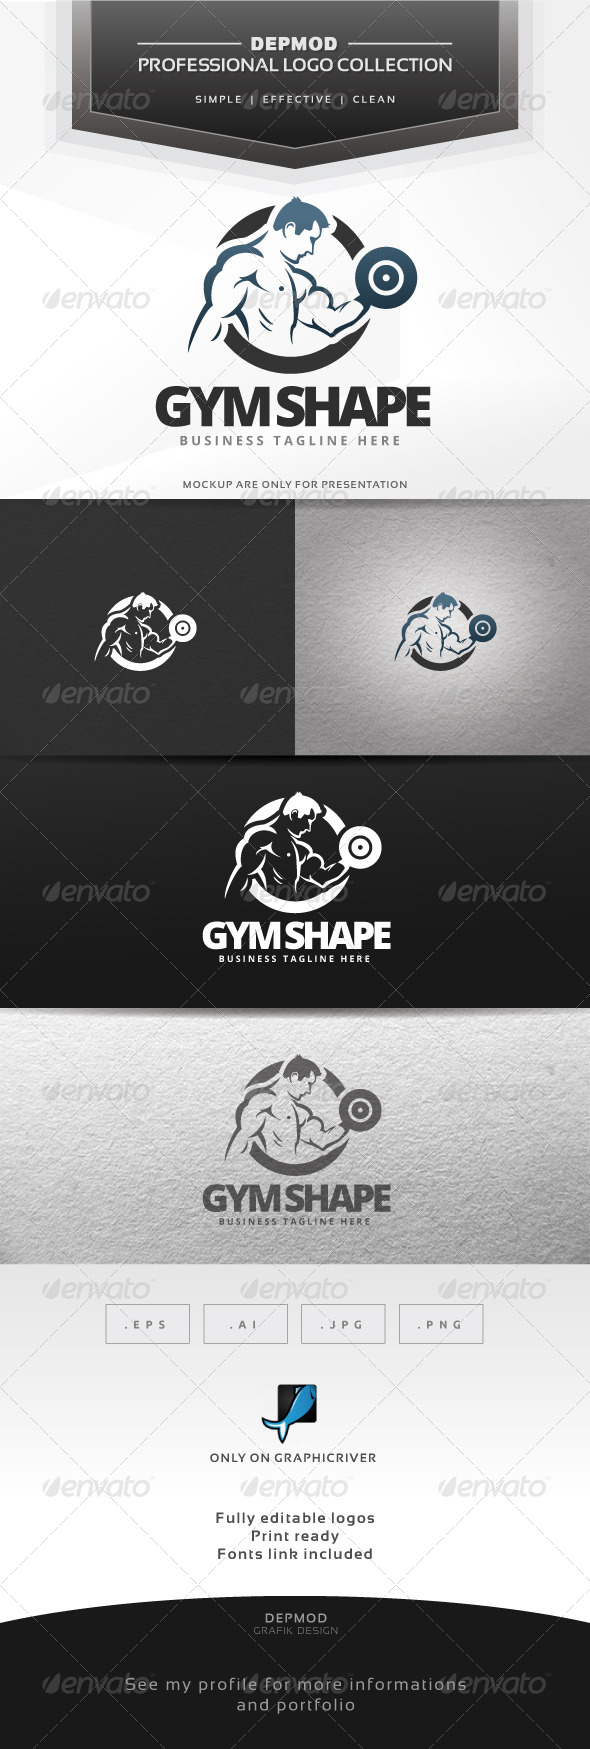 Gym Shape Logo